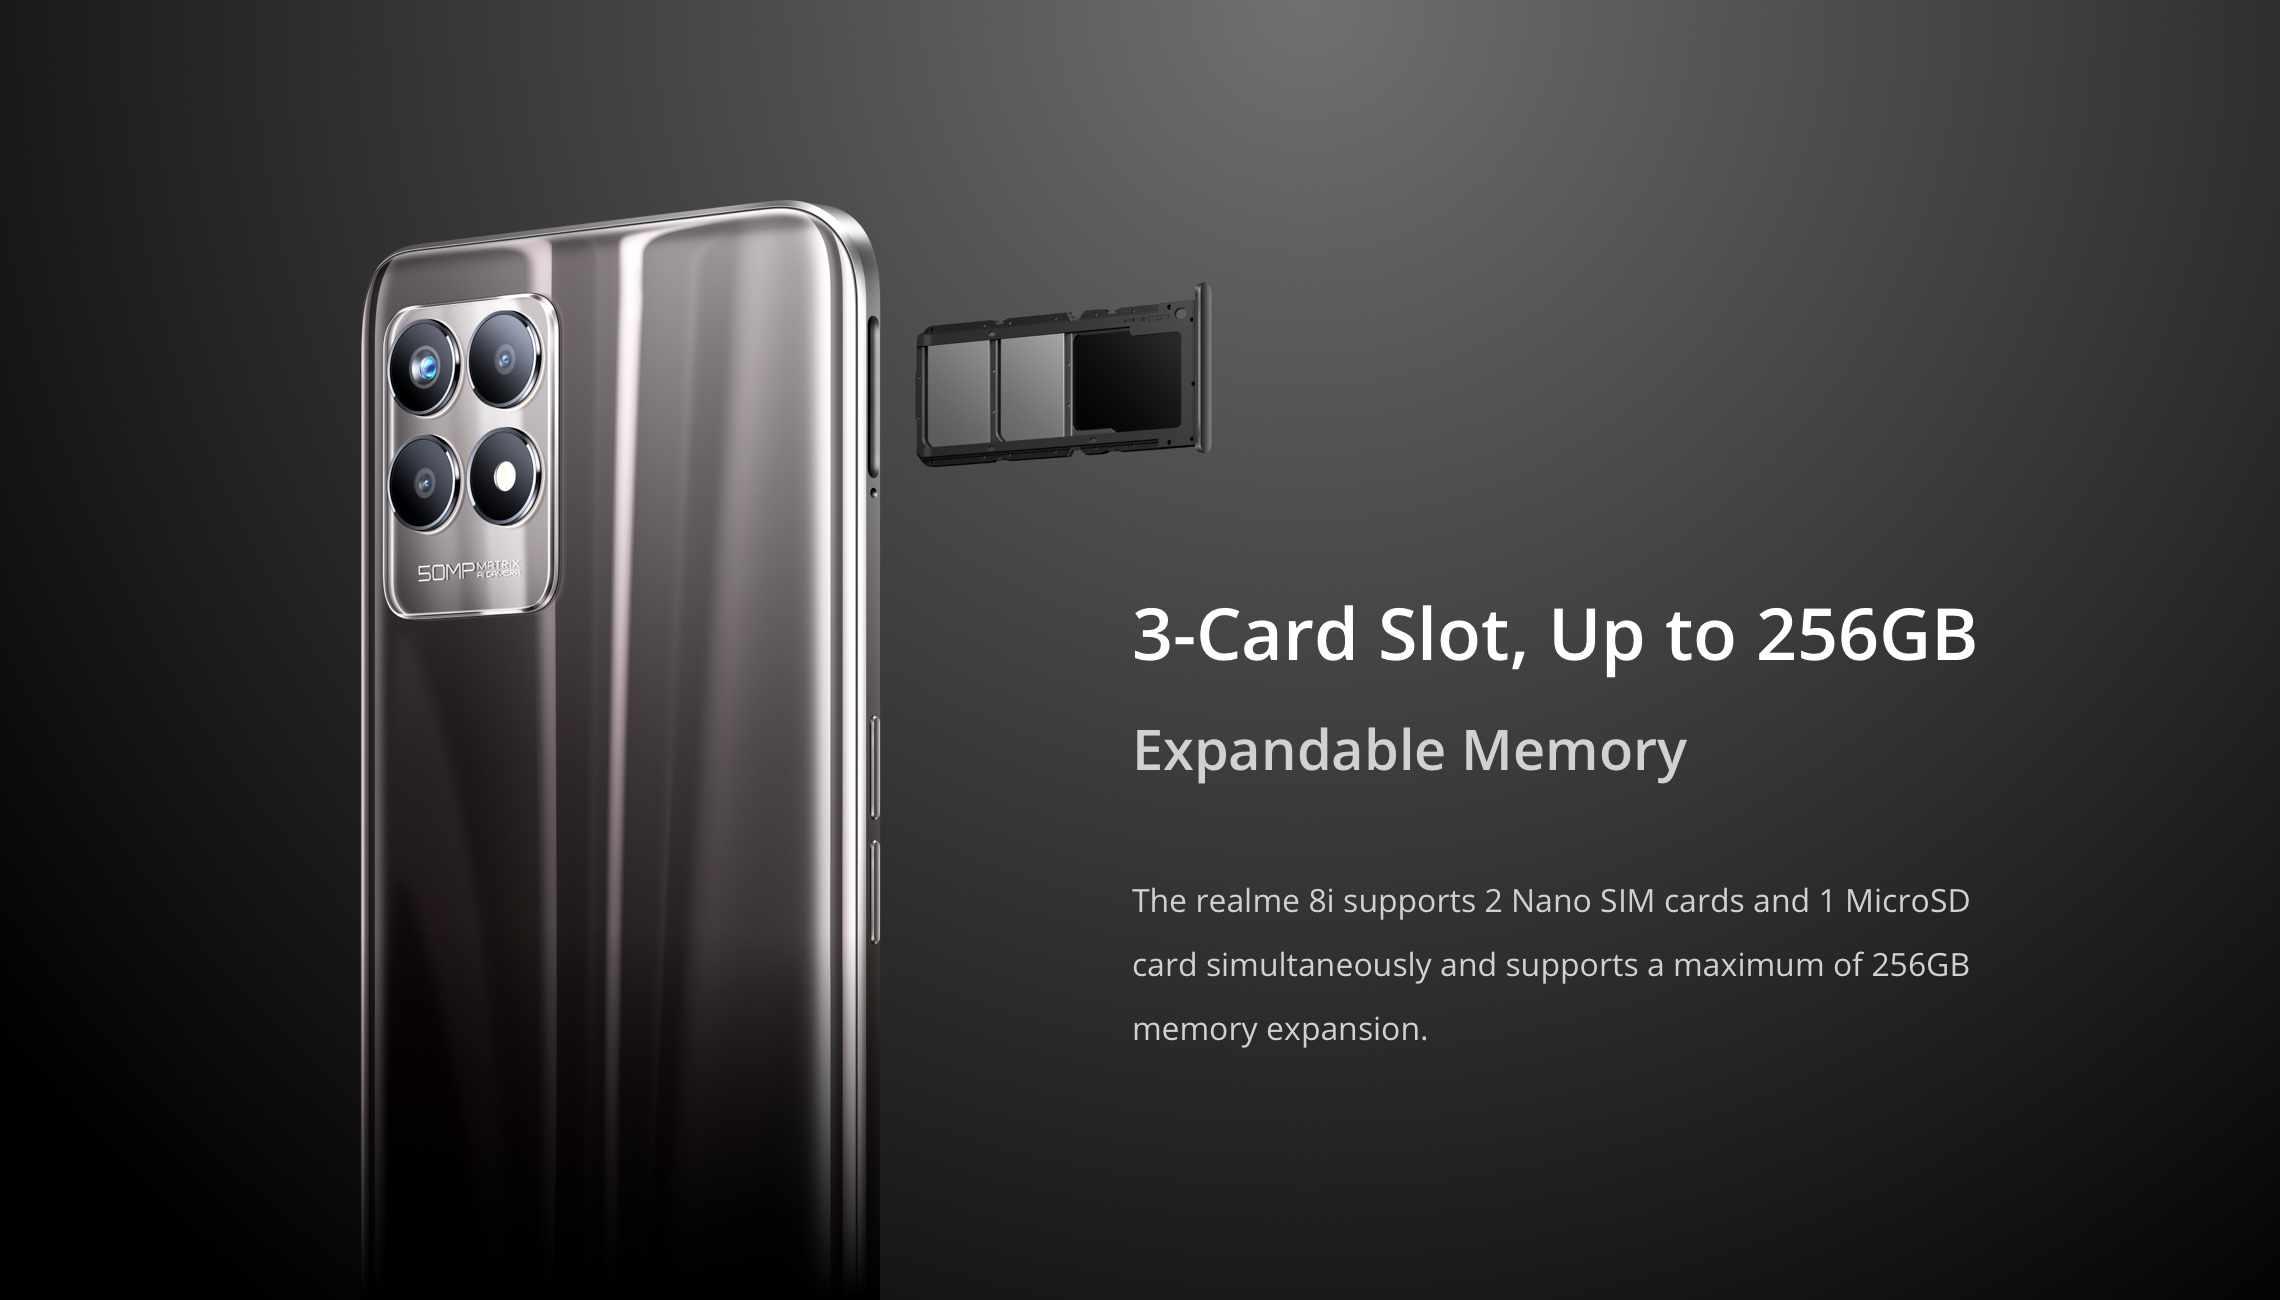 Realme 3 card slot